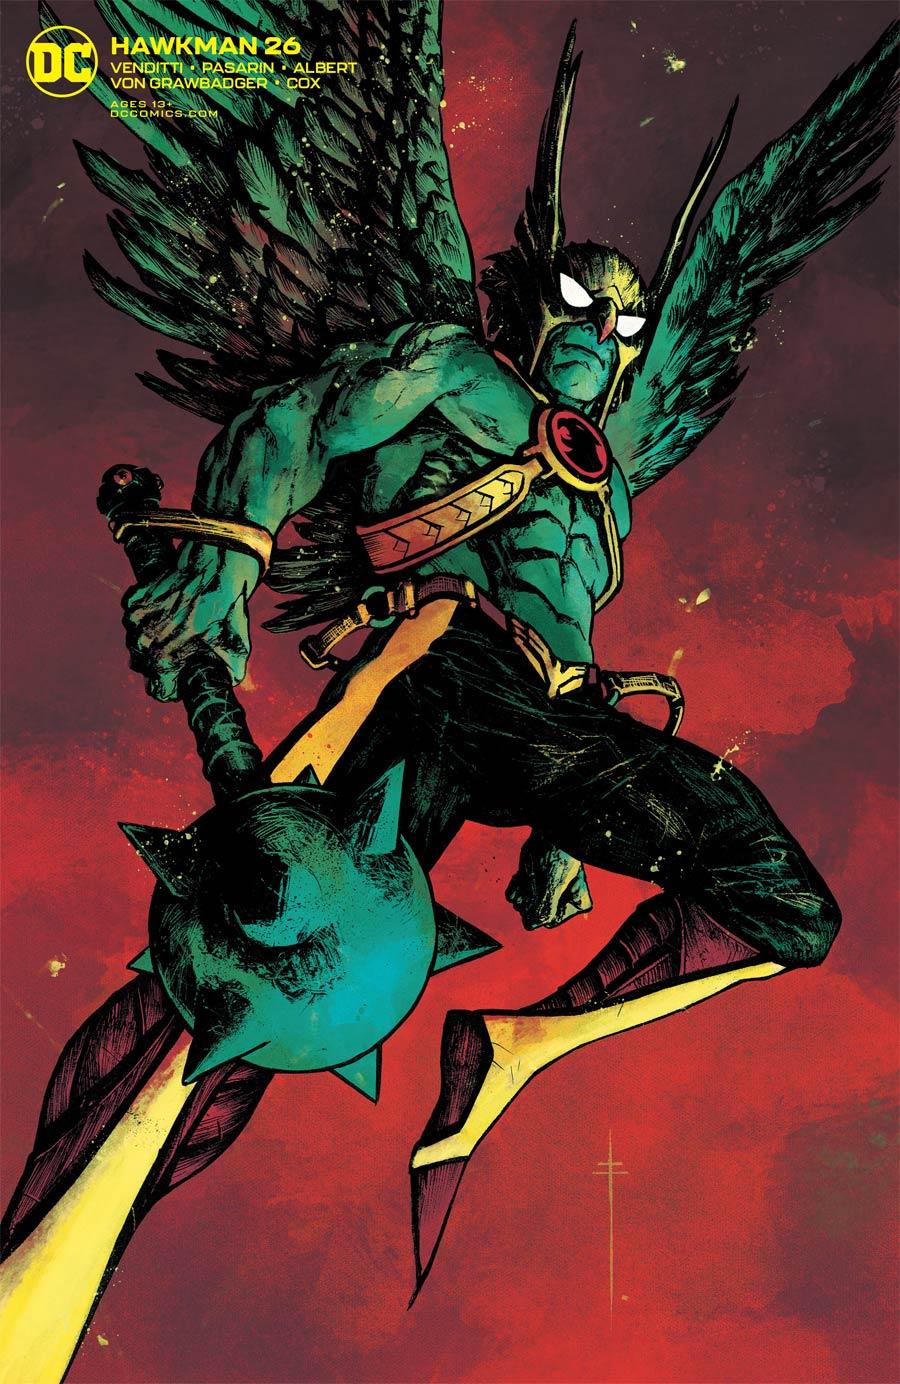 Hawkman Vol 5 #26 Cover B Variant Sebastian Fiumara Cover